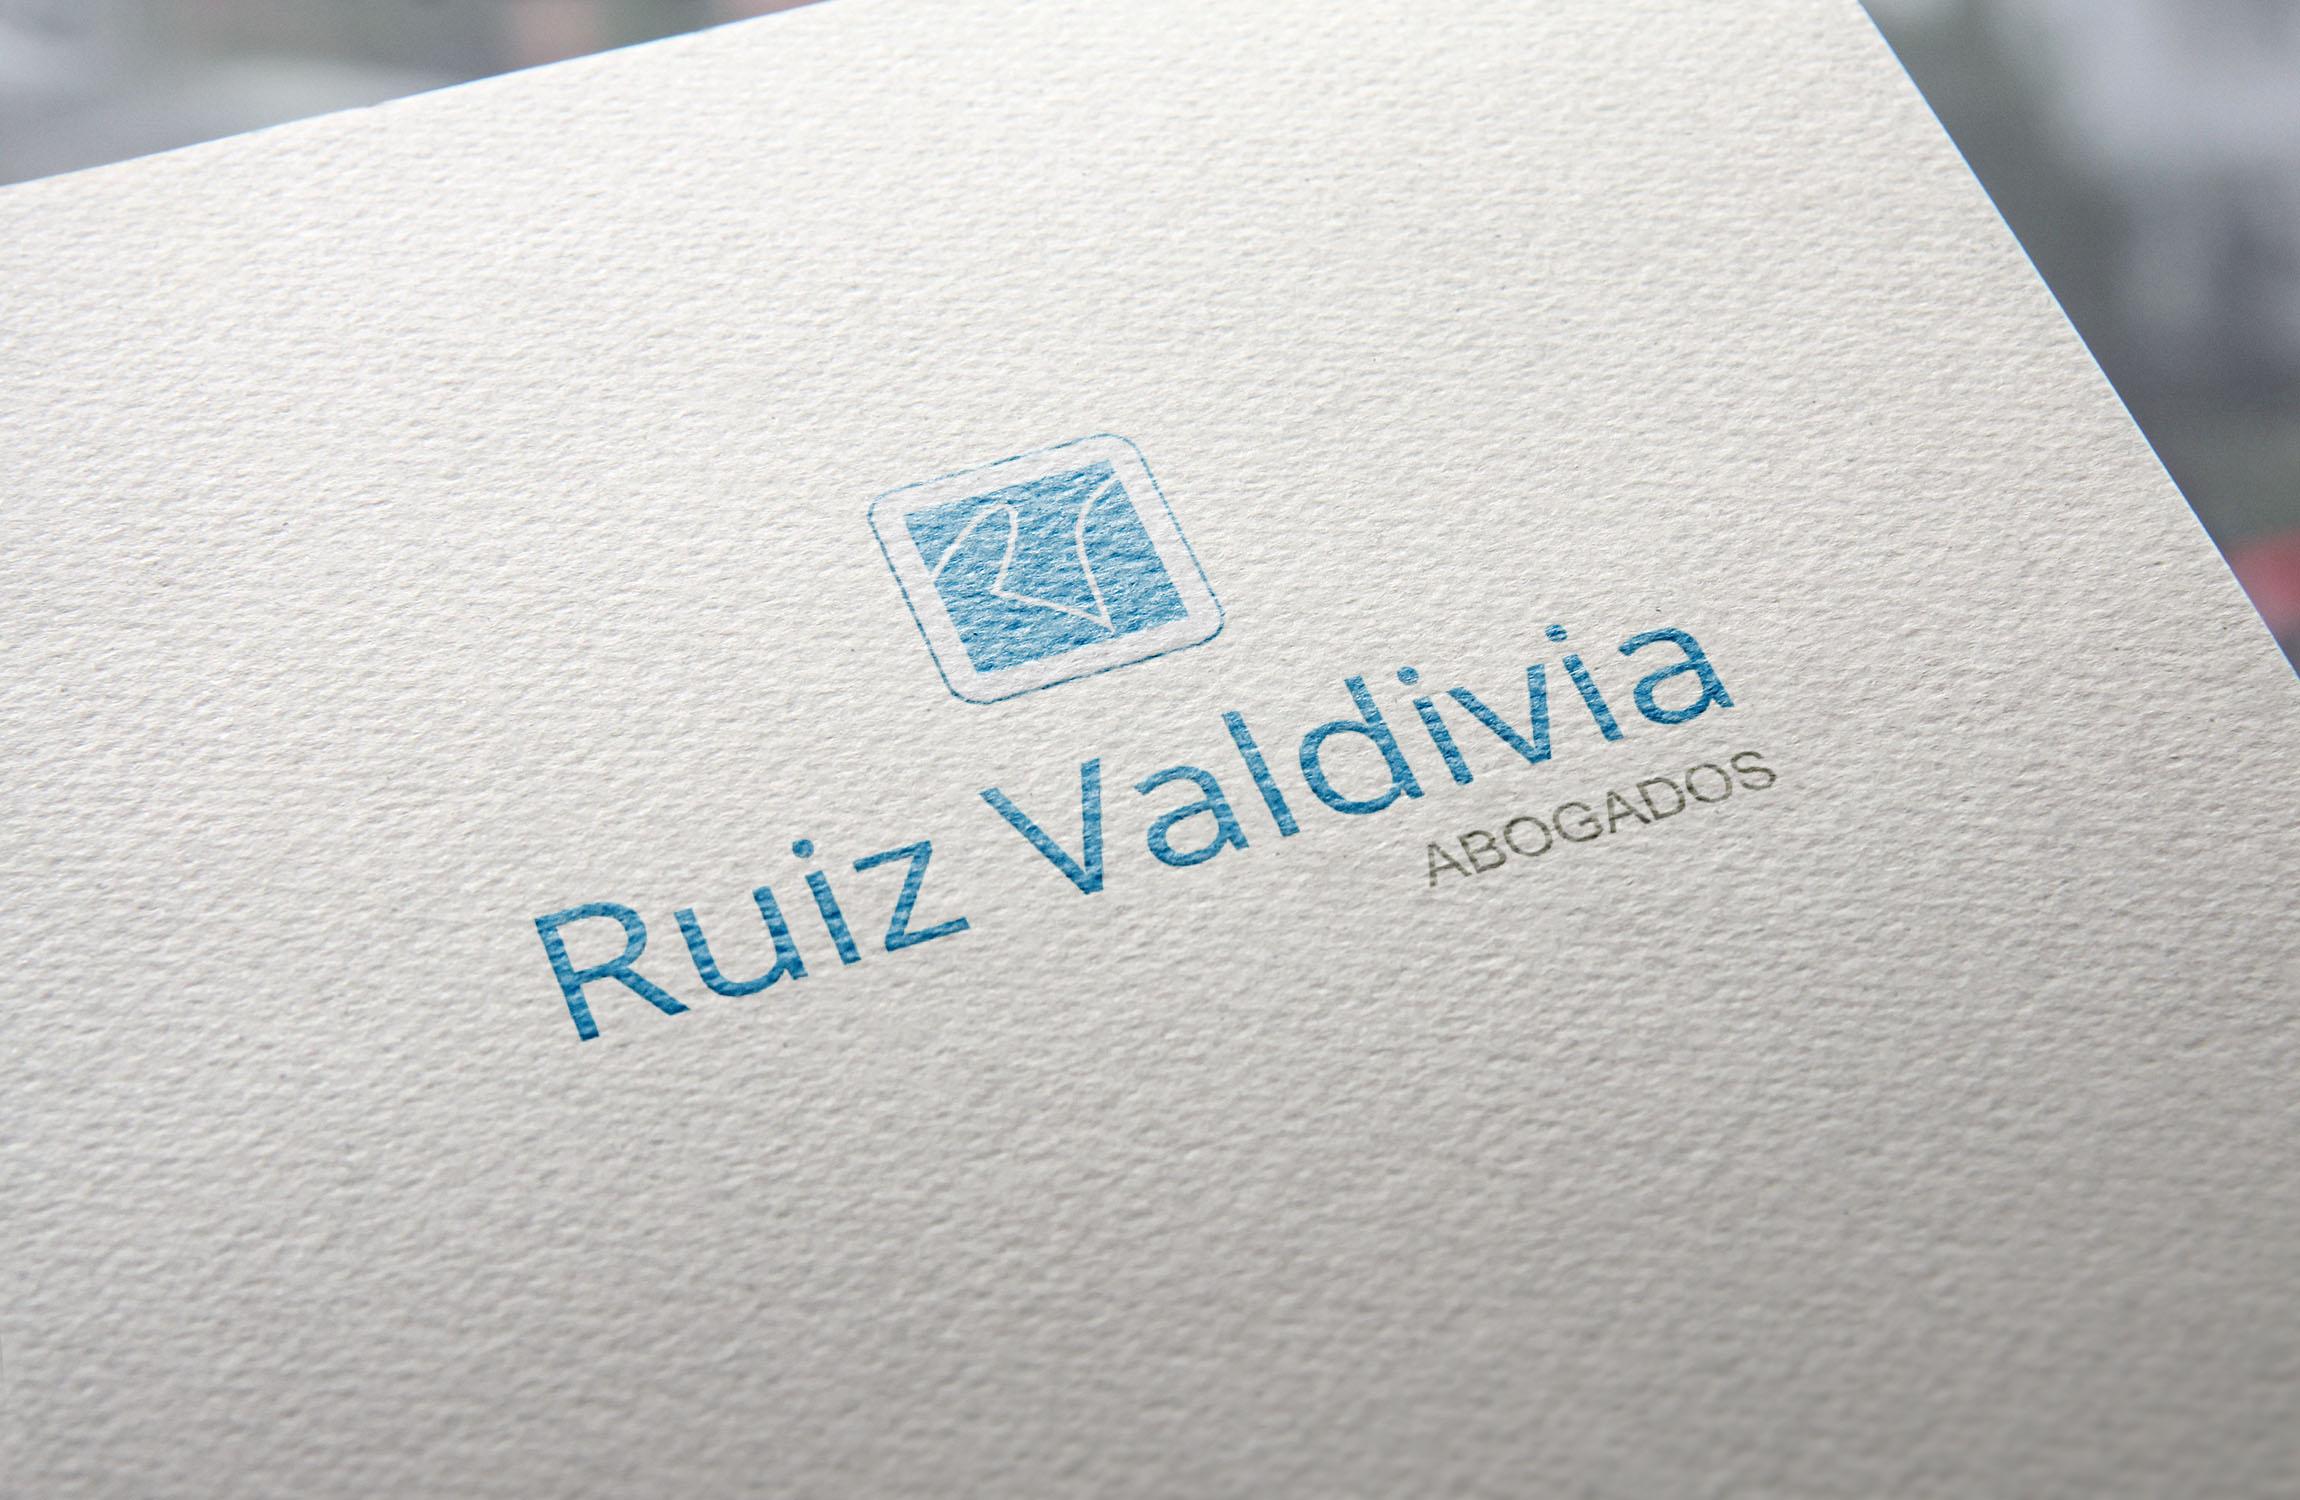 RuizValdivia Abogados